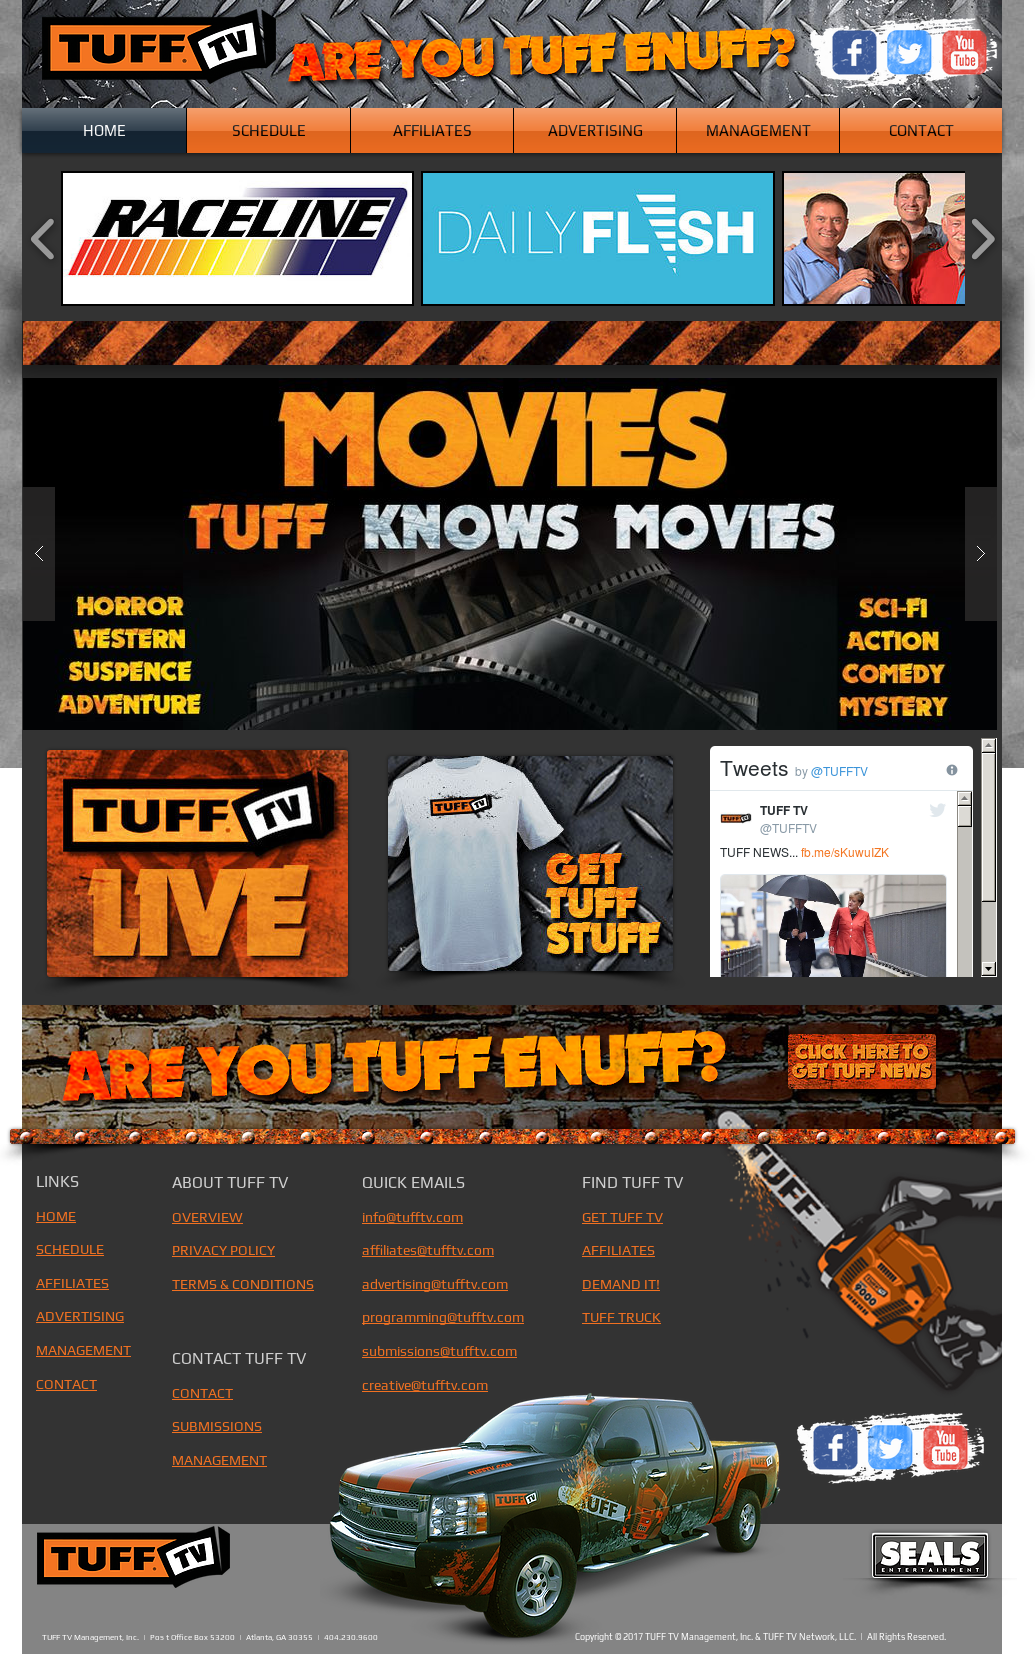 Tuff Tv Network, Llc & Tuff Tv Worldwide Competitors